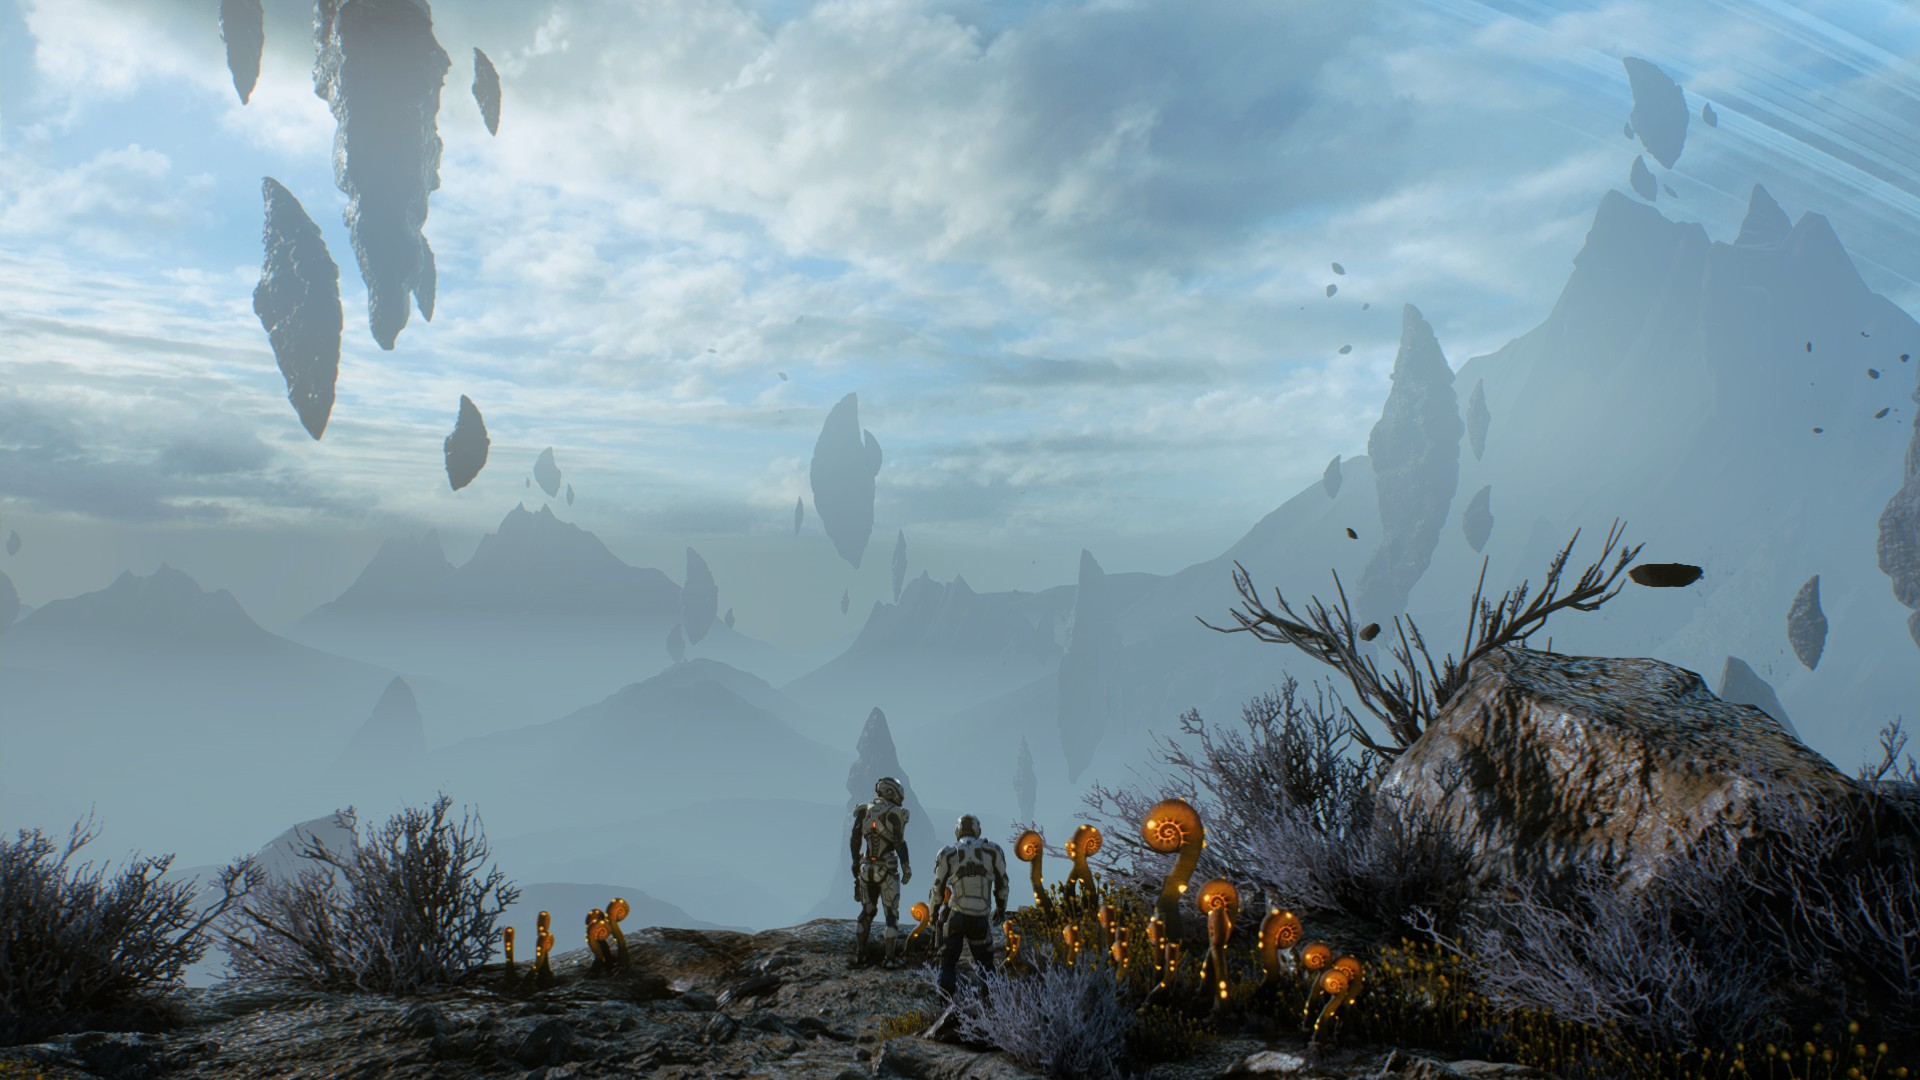 Mass-Effect-Andromeda-Habitat-1920x1080-OC-Need-iPhone-S-Plus-Background-wallpaper-wpc5807055